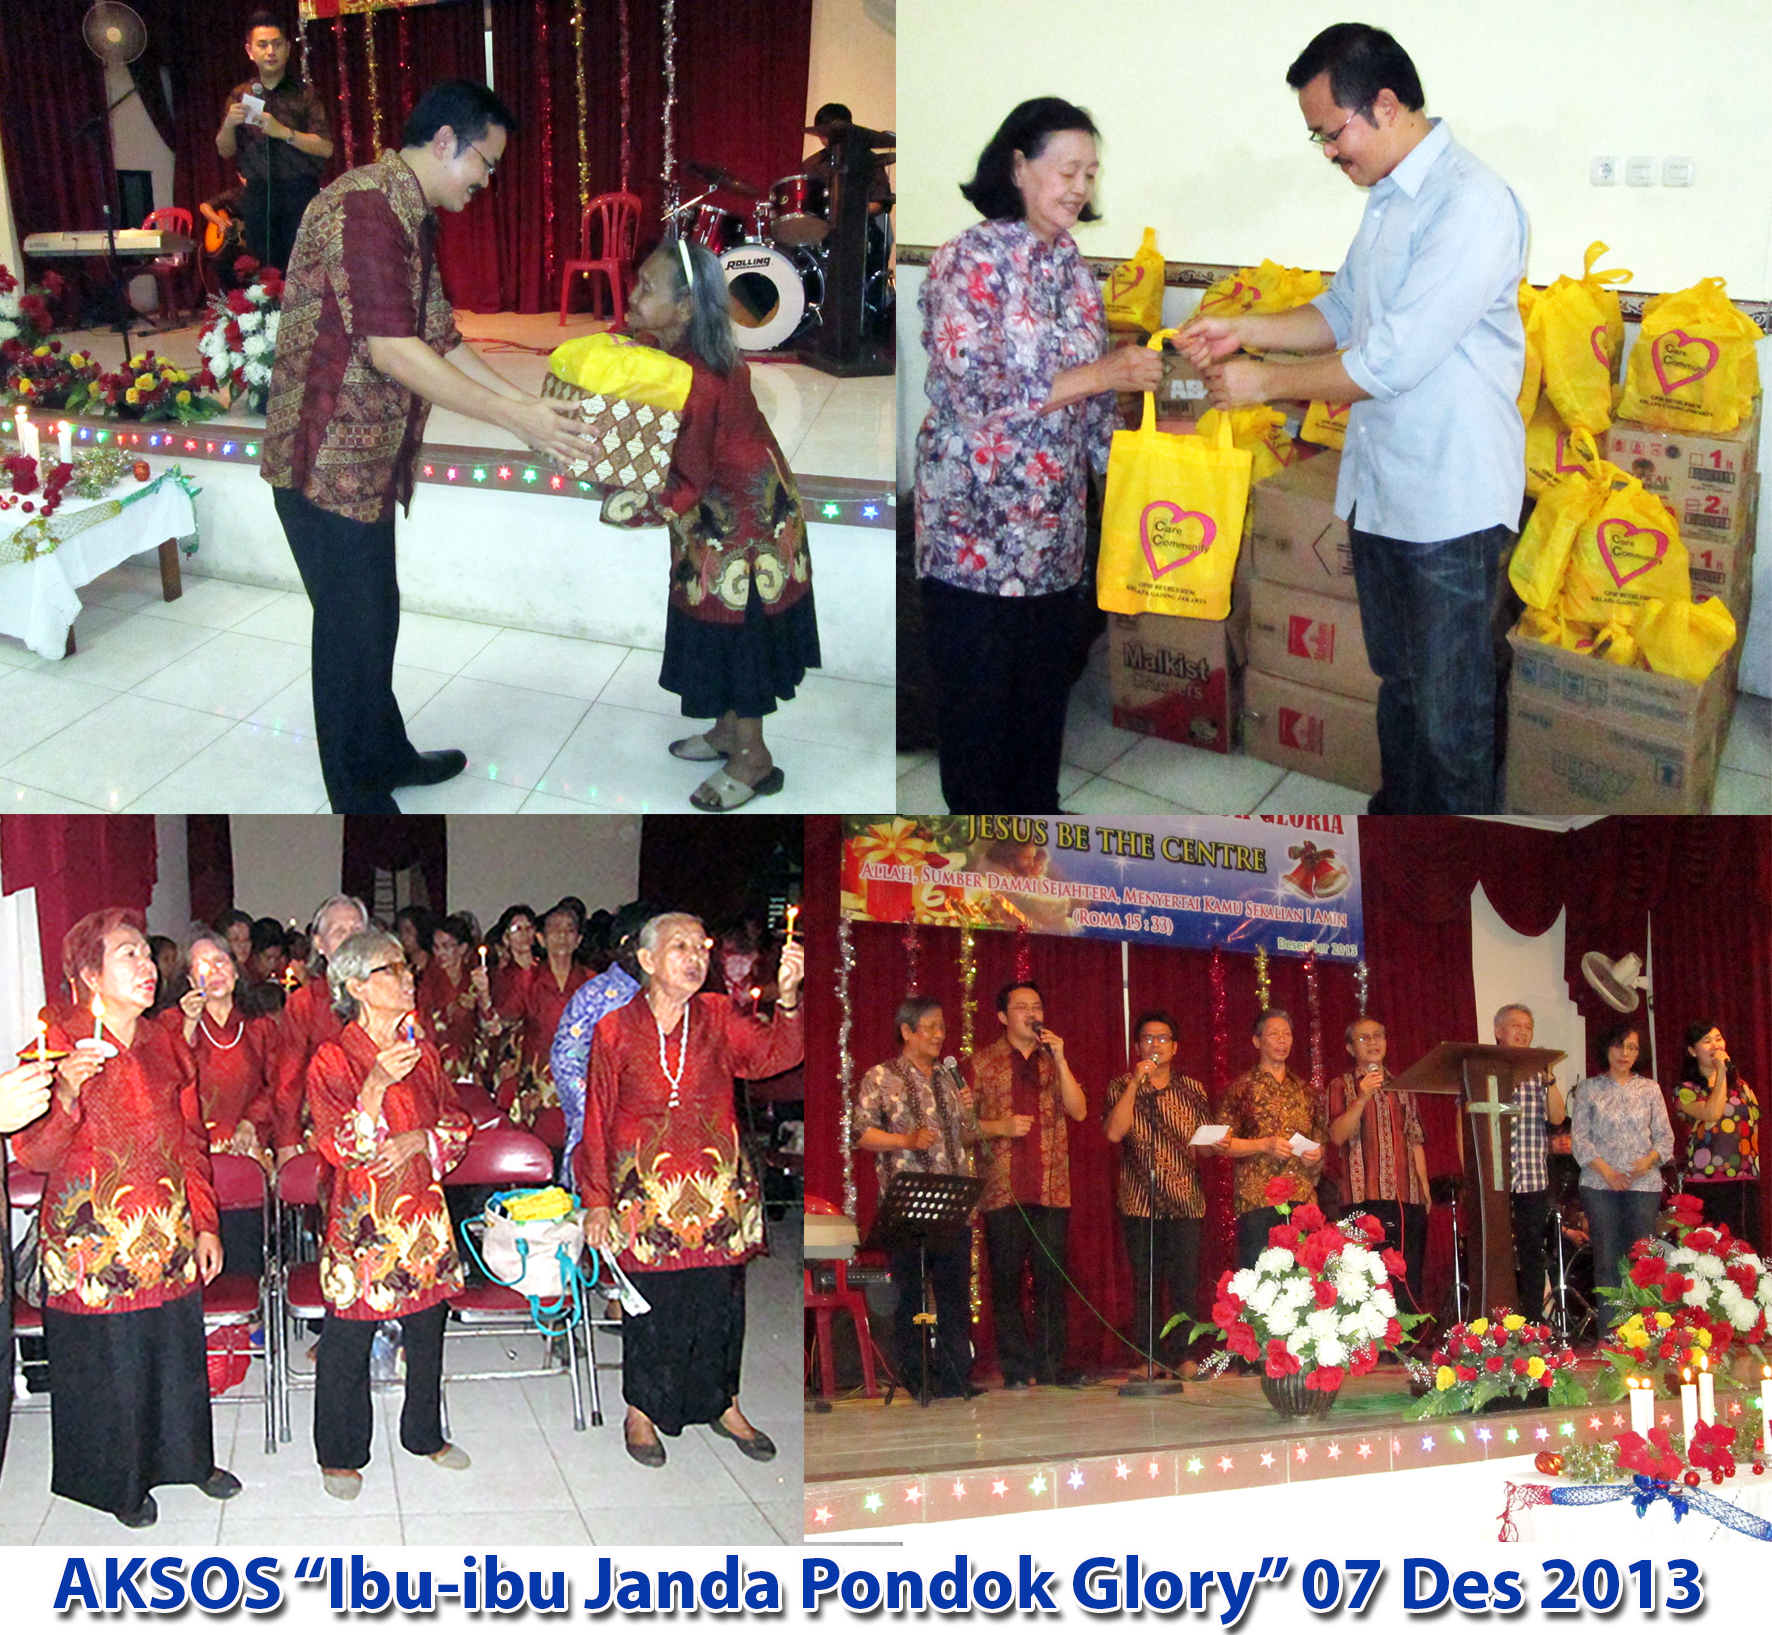 Aksos Ibu janda2 pondok Glory 07 Des 2013 b